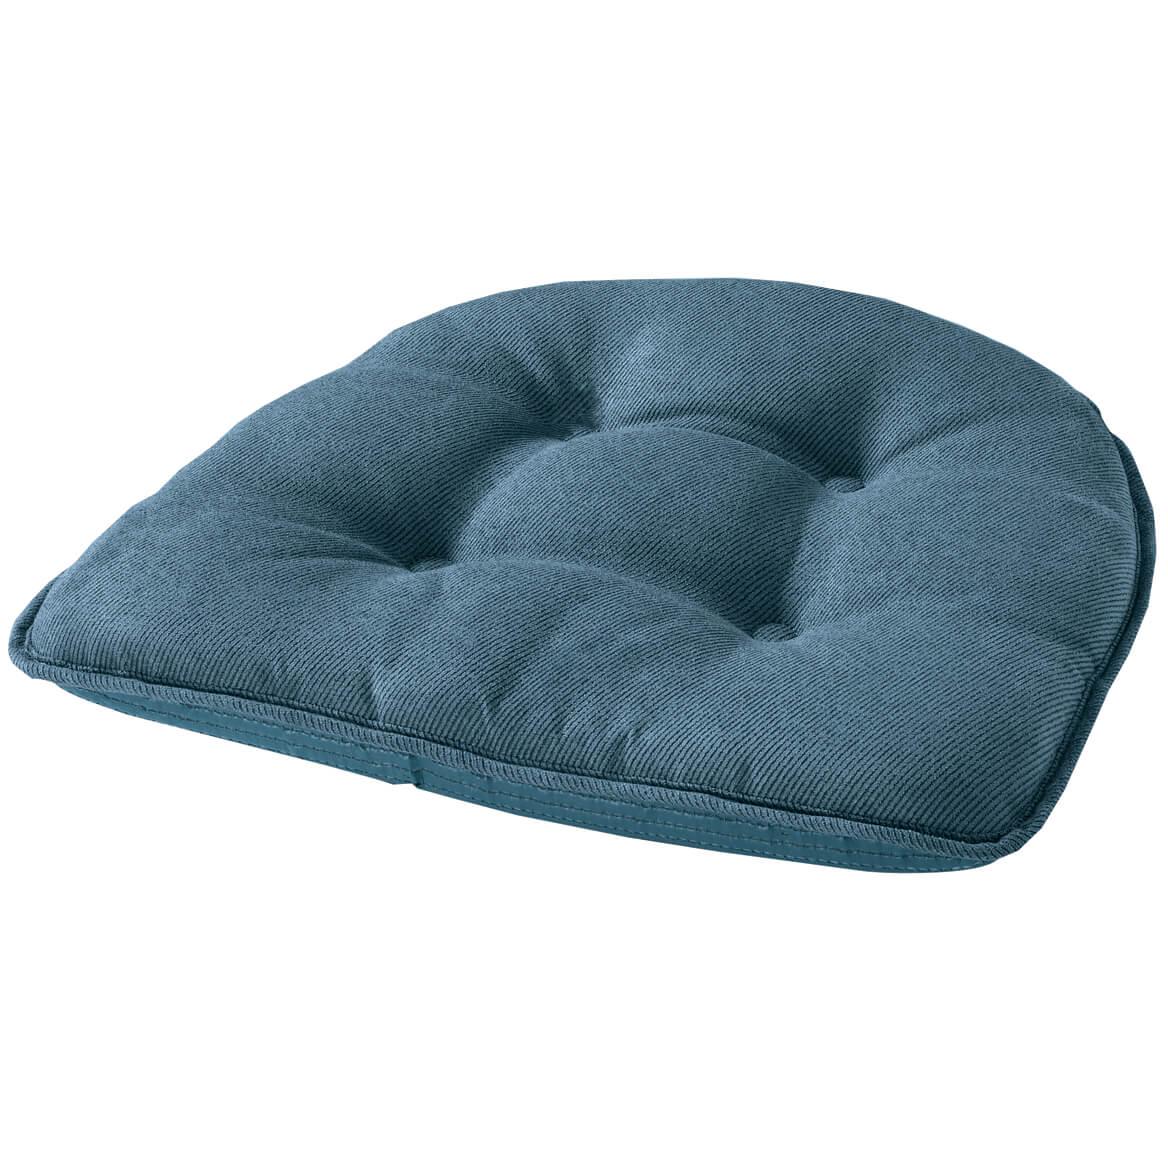 Twillo Chair Pad 339434